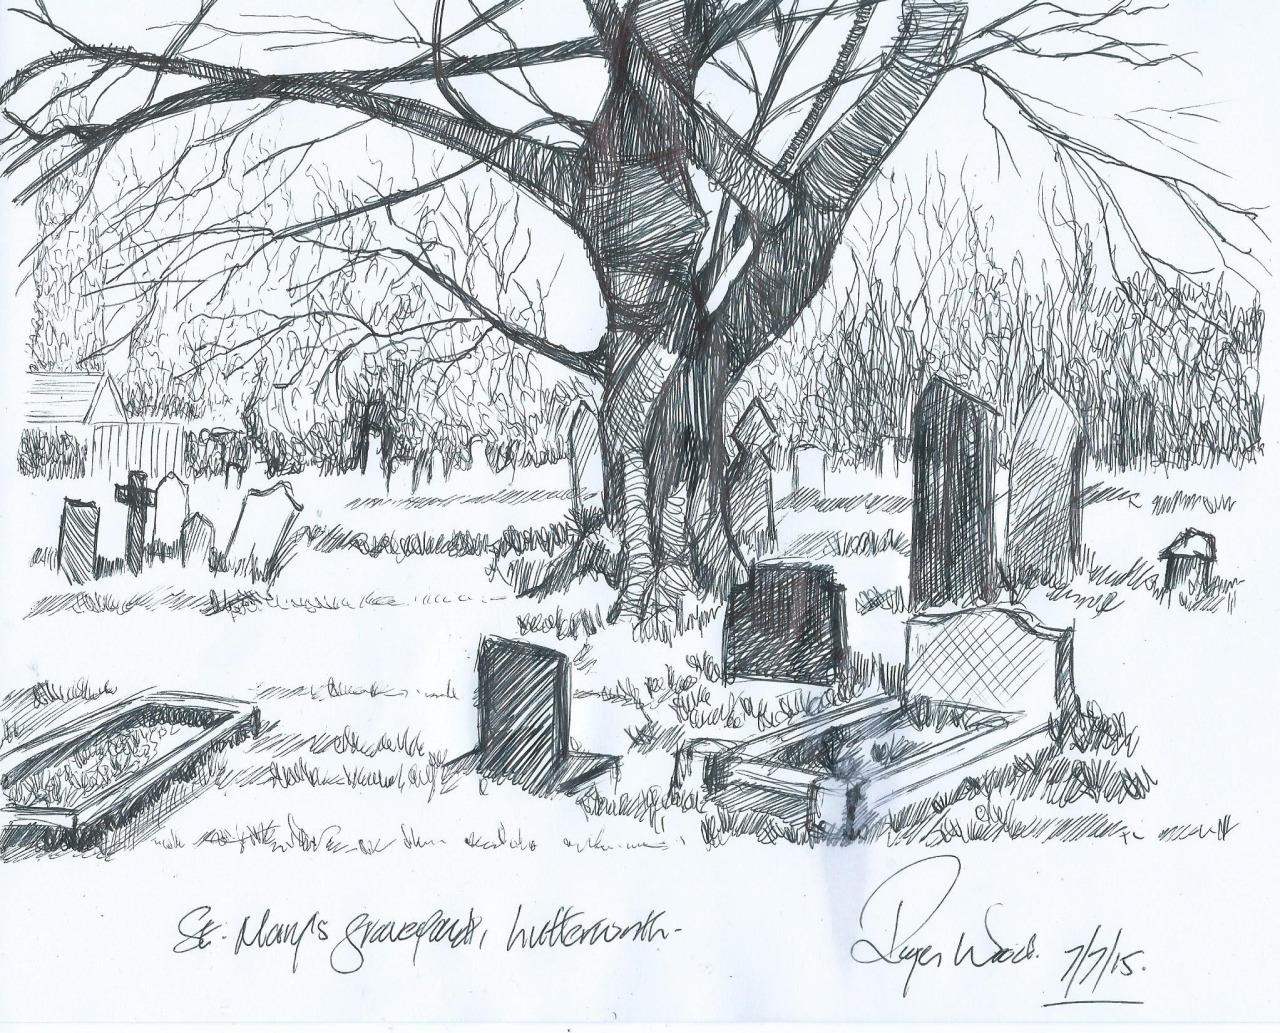 Drawn graveyard pencil drawing Realistic High Drawing Graveyard Drawing